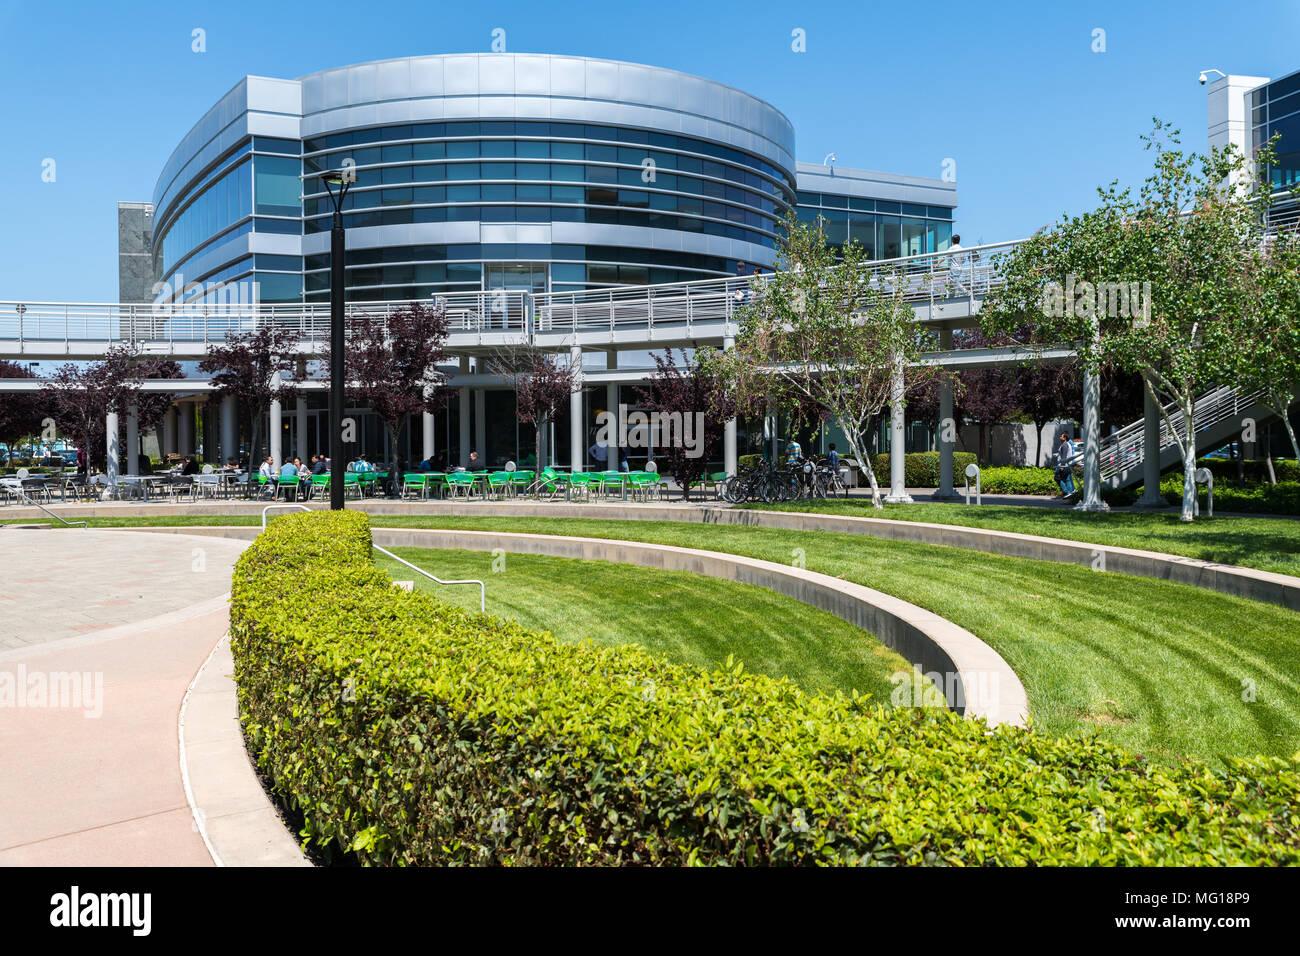 Santa Clara, California, USA - April 26, 2018: NVDIA Corporation, headquarters in Silicon Valley. NVDIA Corporation is an American technology company, Stock Photo